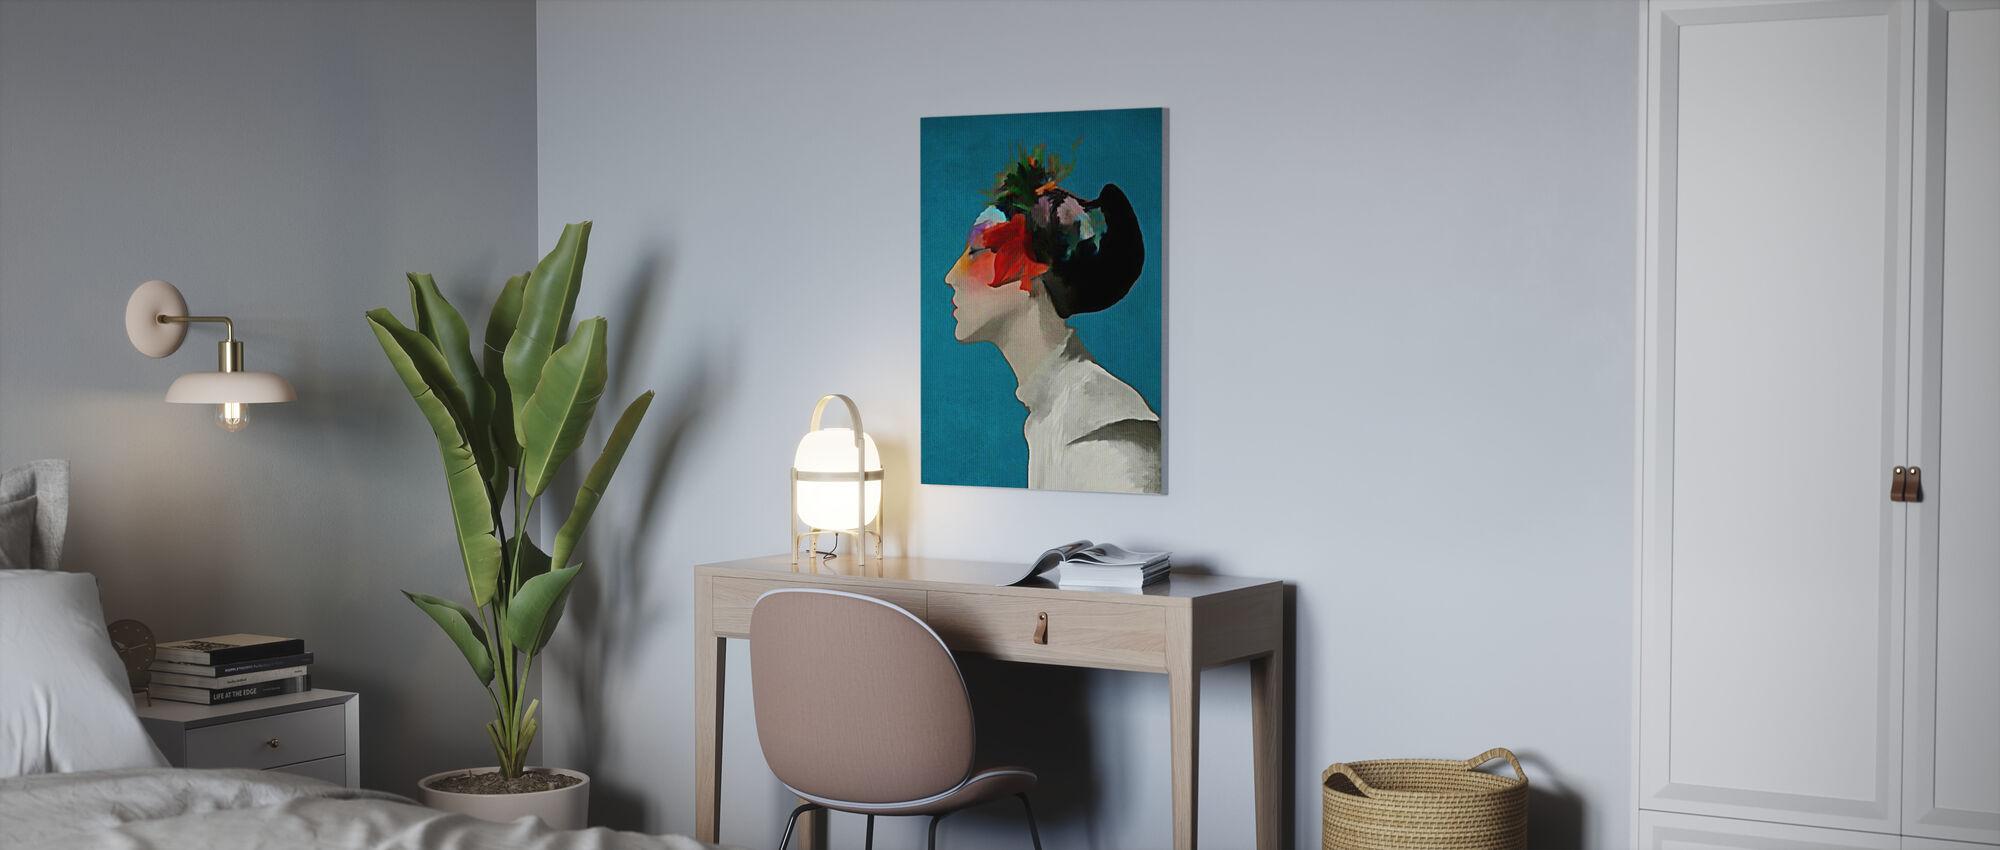 Kimono - Canvas print - Office